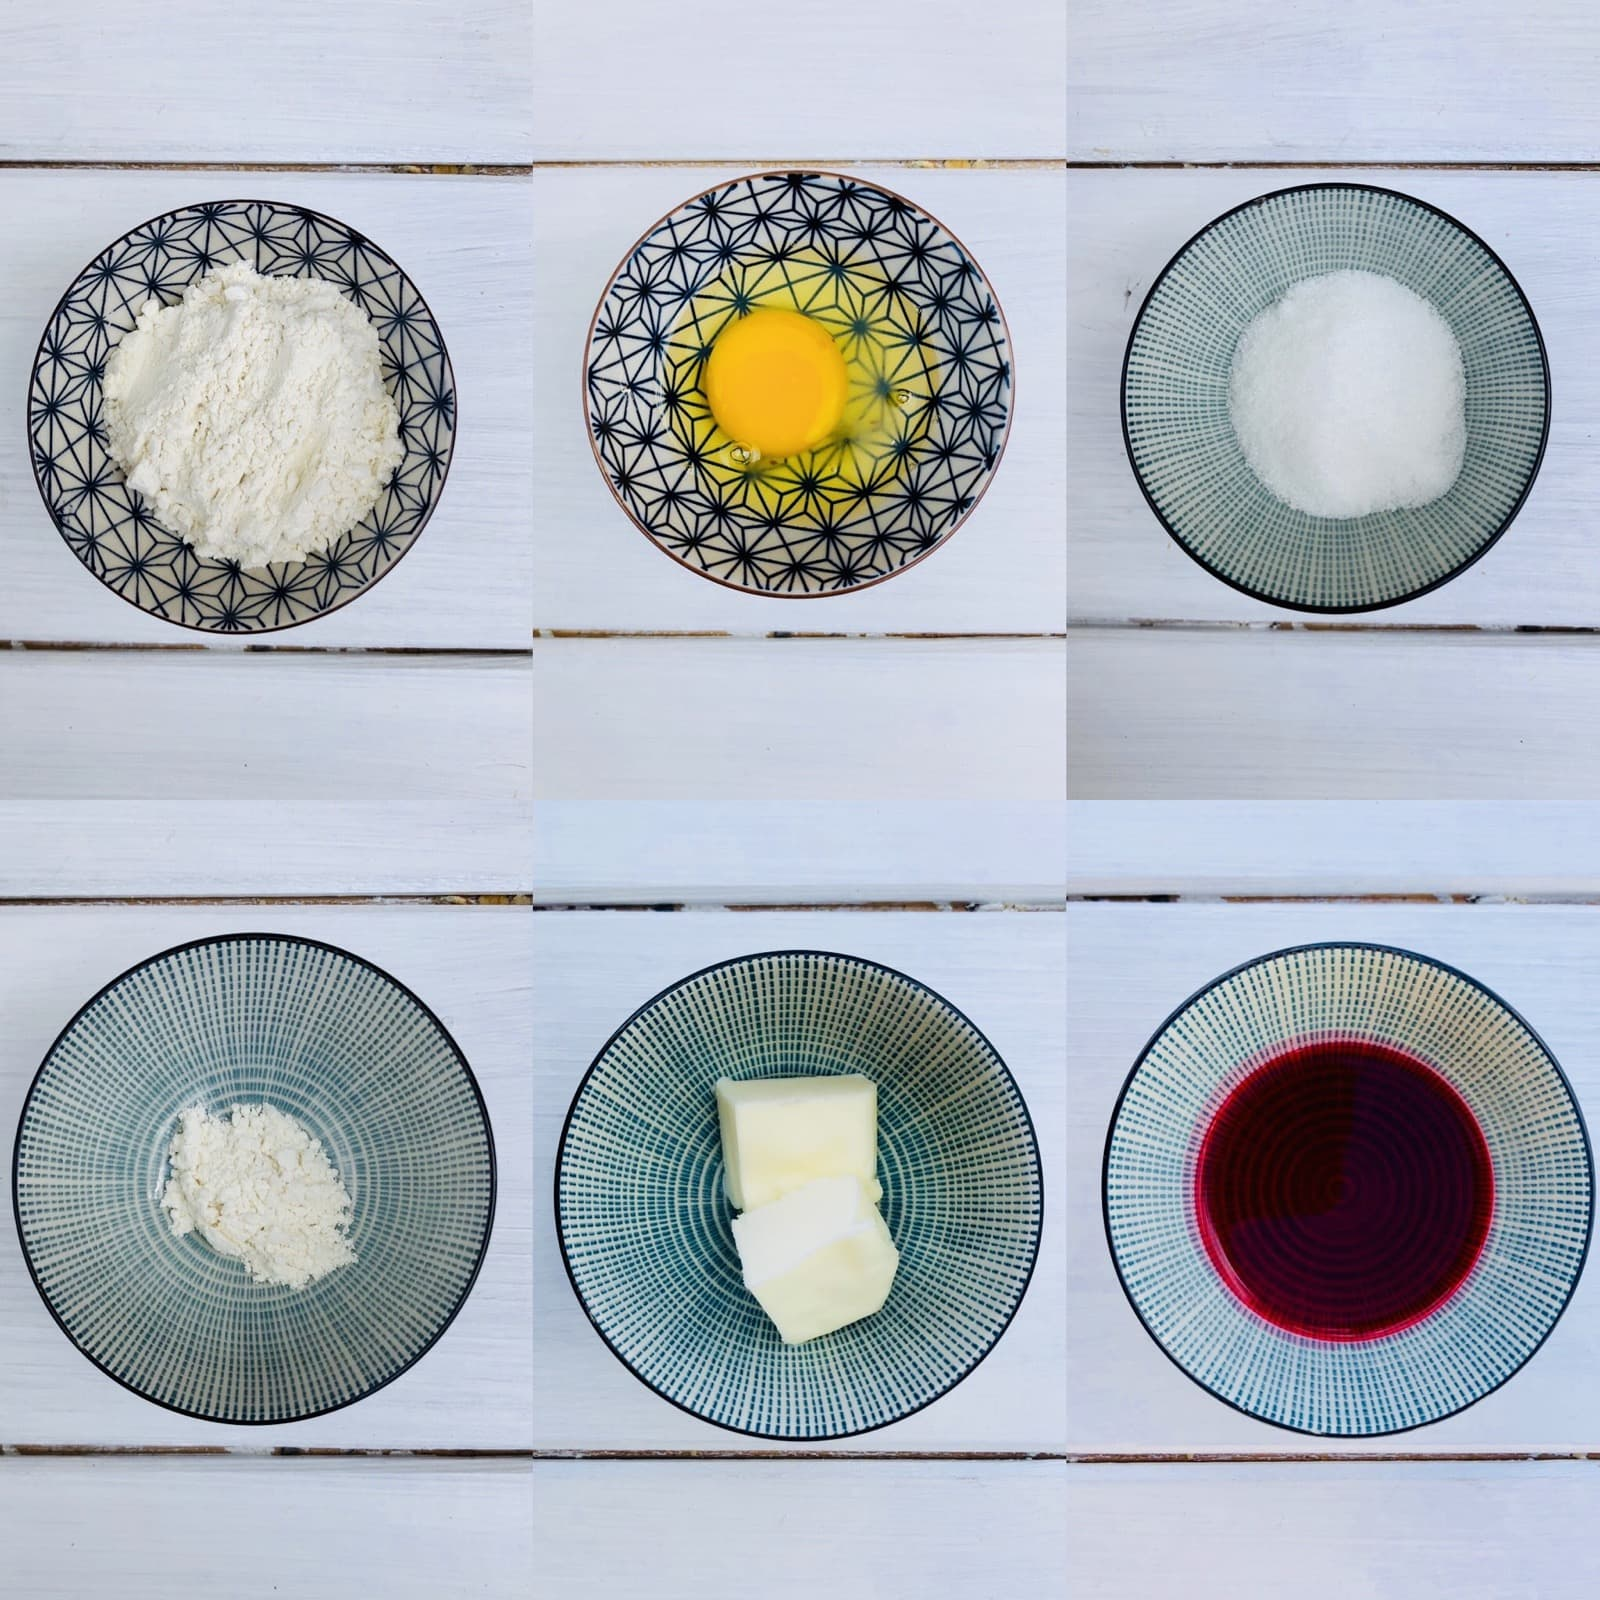 Pesche Romagnole, ingredients Ph. Federica Cortezzi